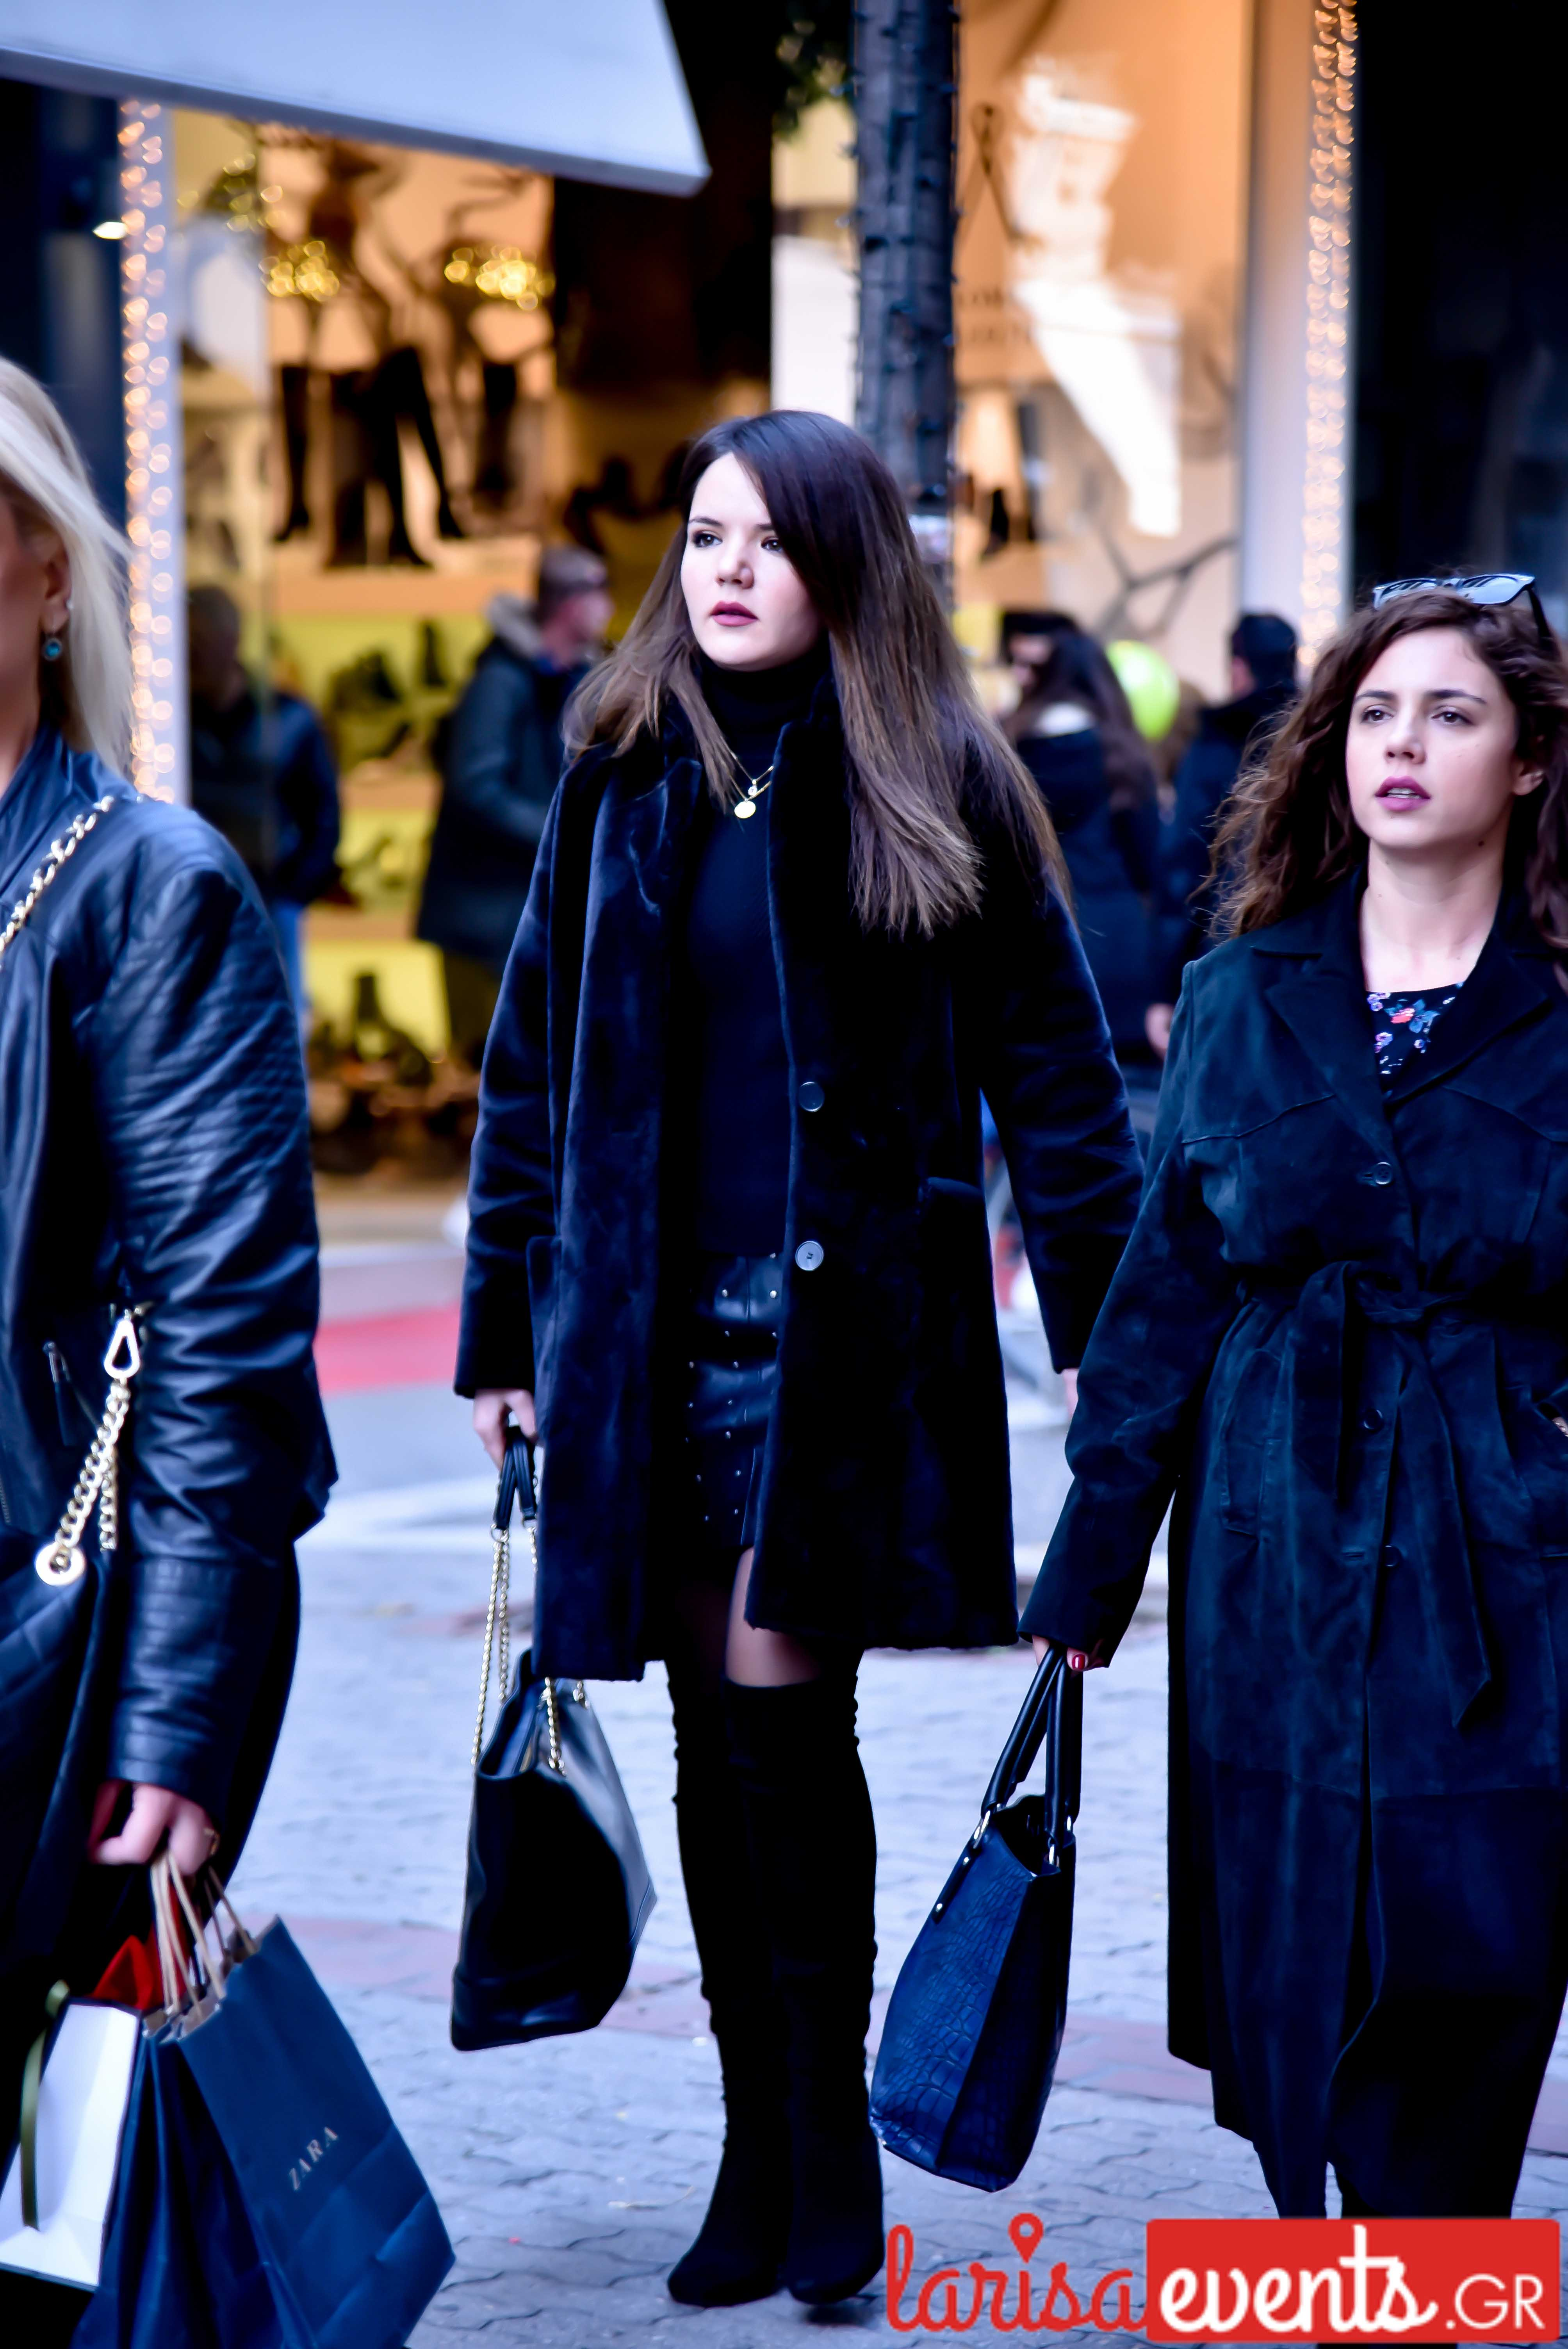 LAZ 7394 - Λάρισα's Street Style | Οι γυναίκες της πόλης σε street style clicks!